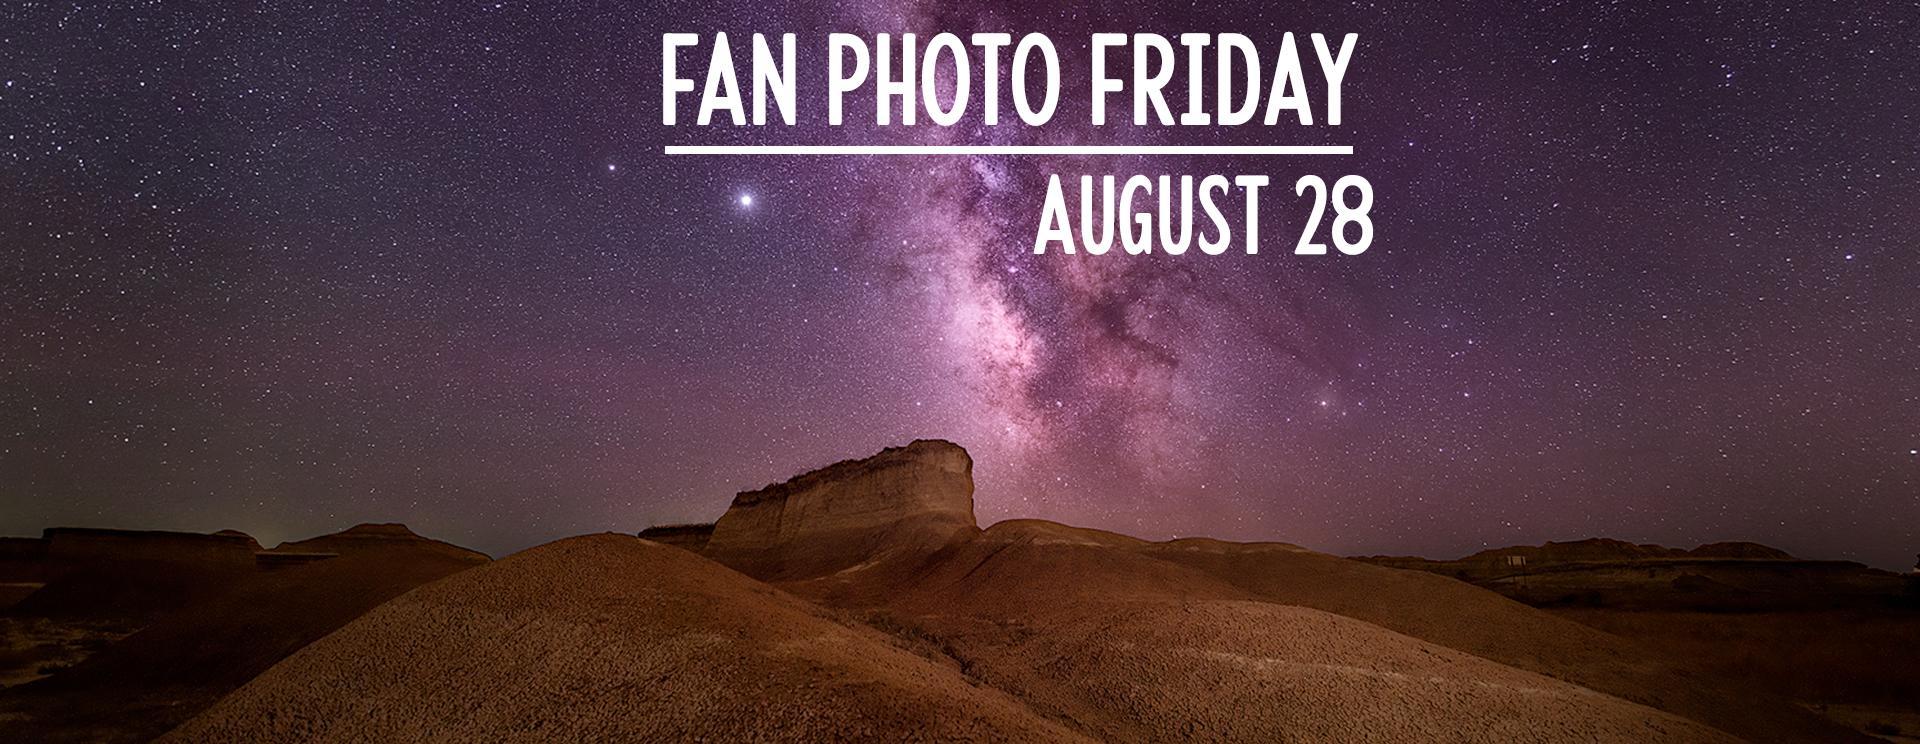 Fan Photo Friday | August 28, 2020